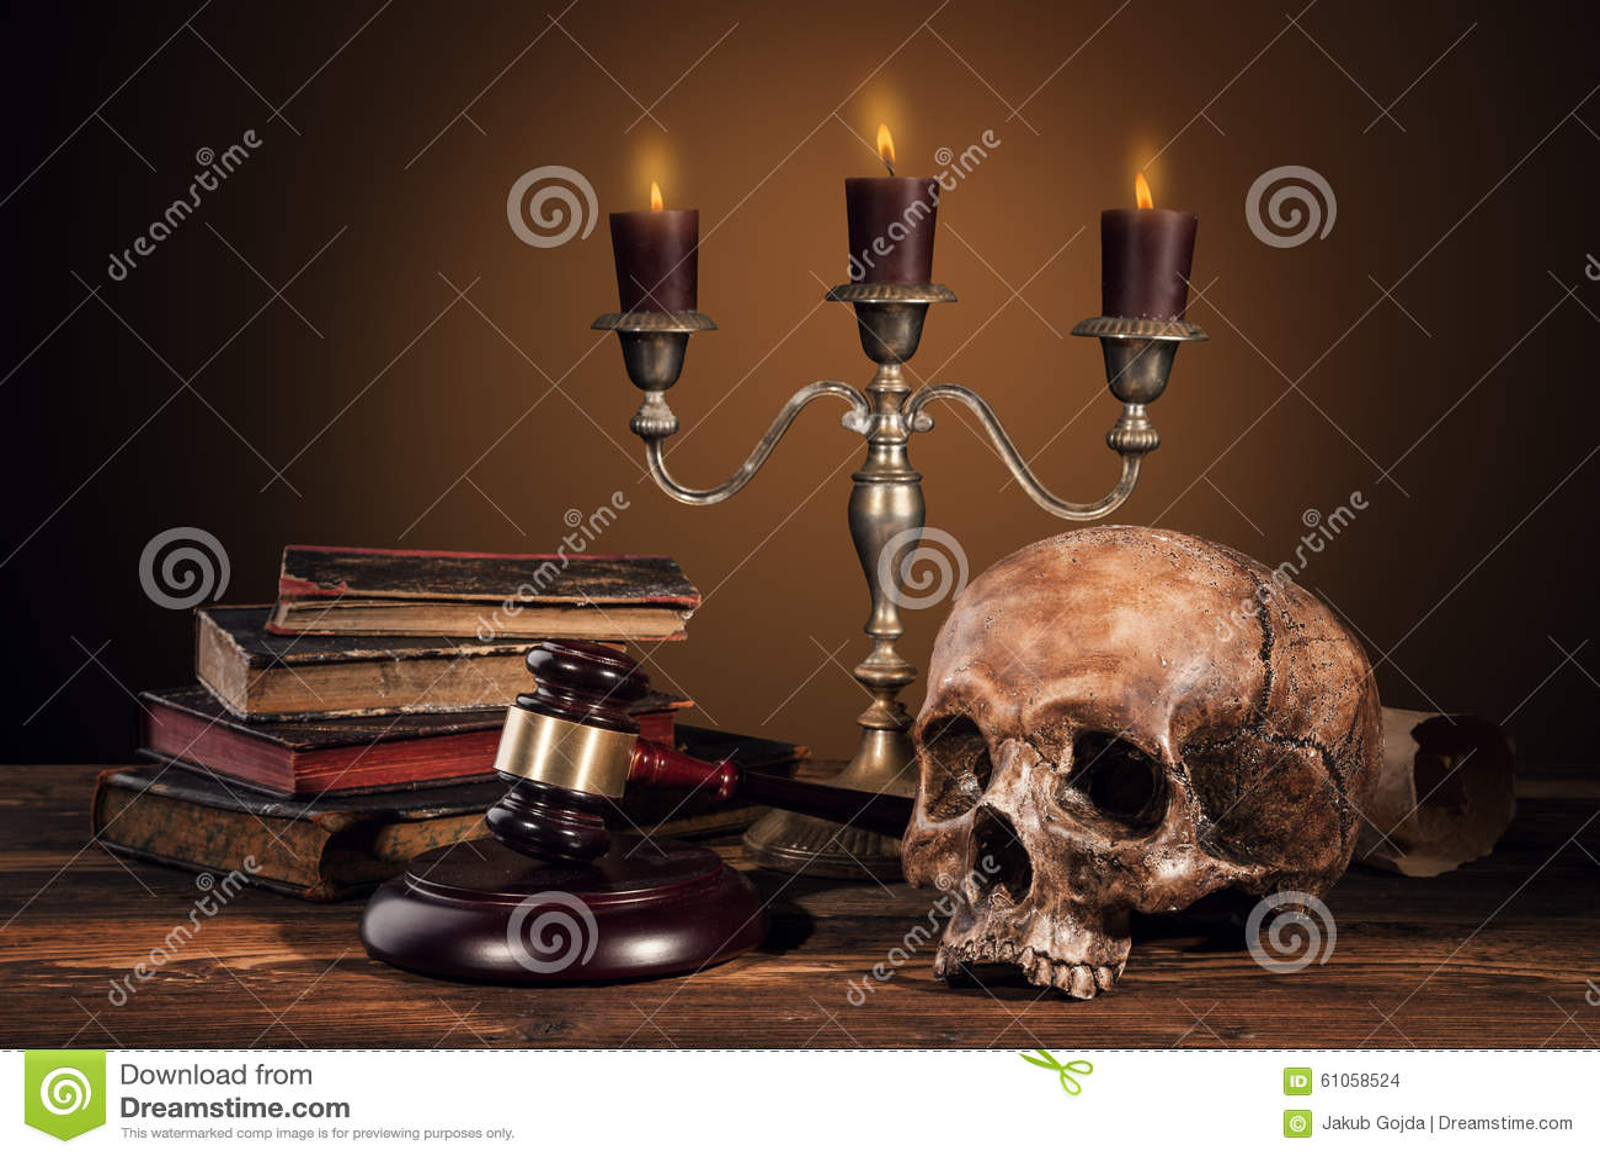 Still life art photography on human skull skeleton